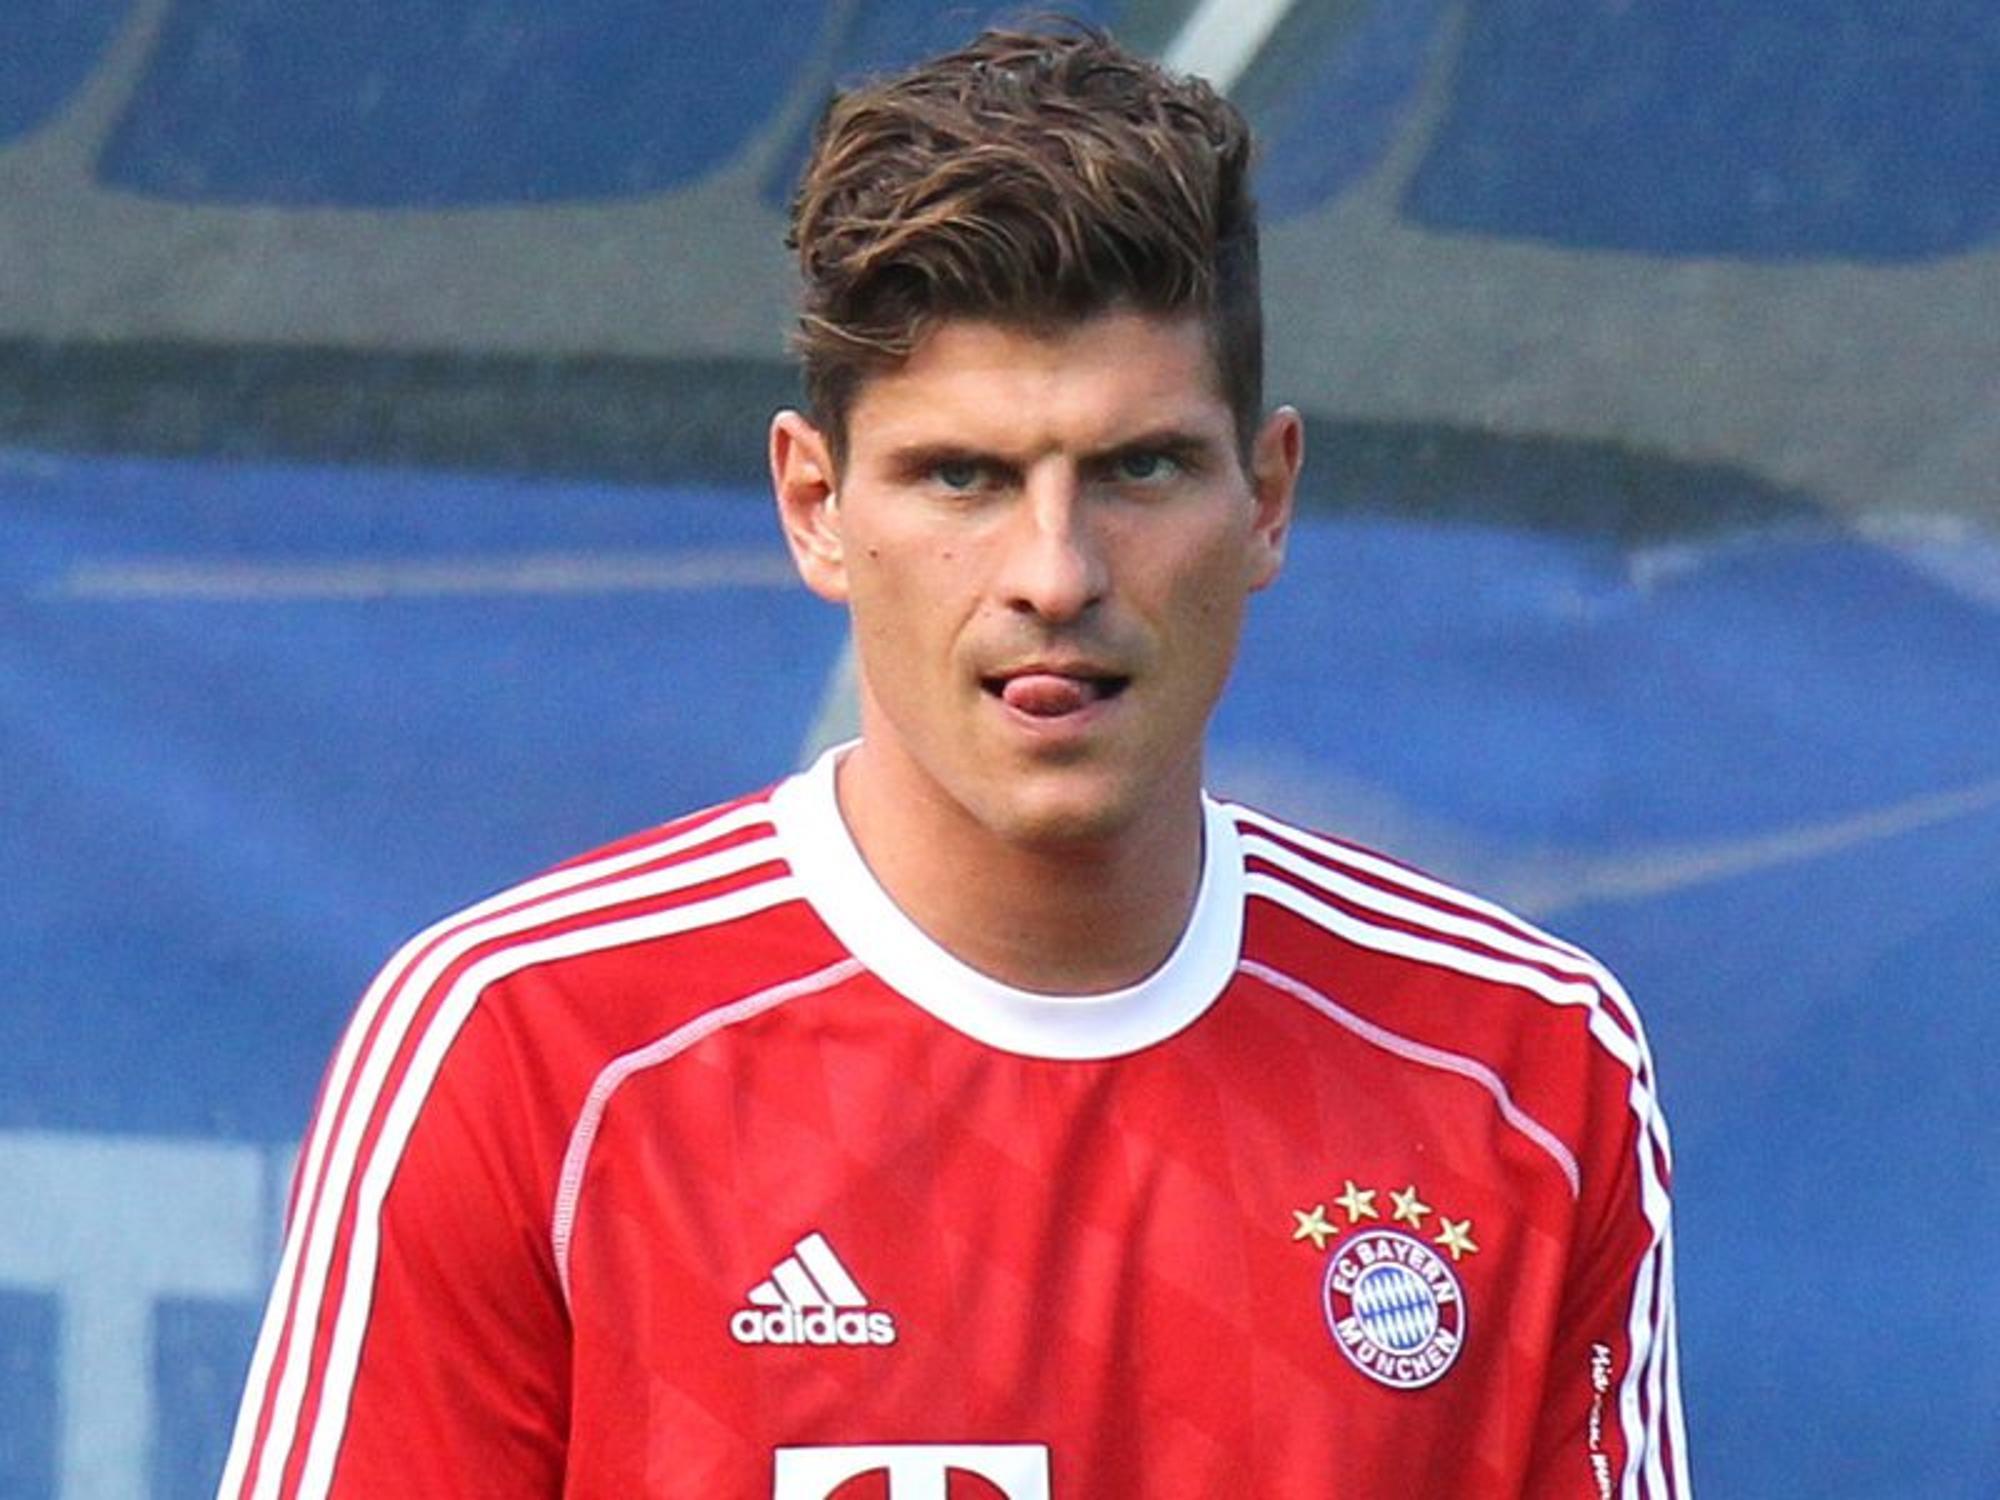 Schalke Draxler Sagt Nie Nie Barnetta Will Weg Fussball